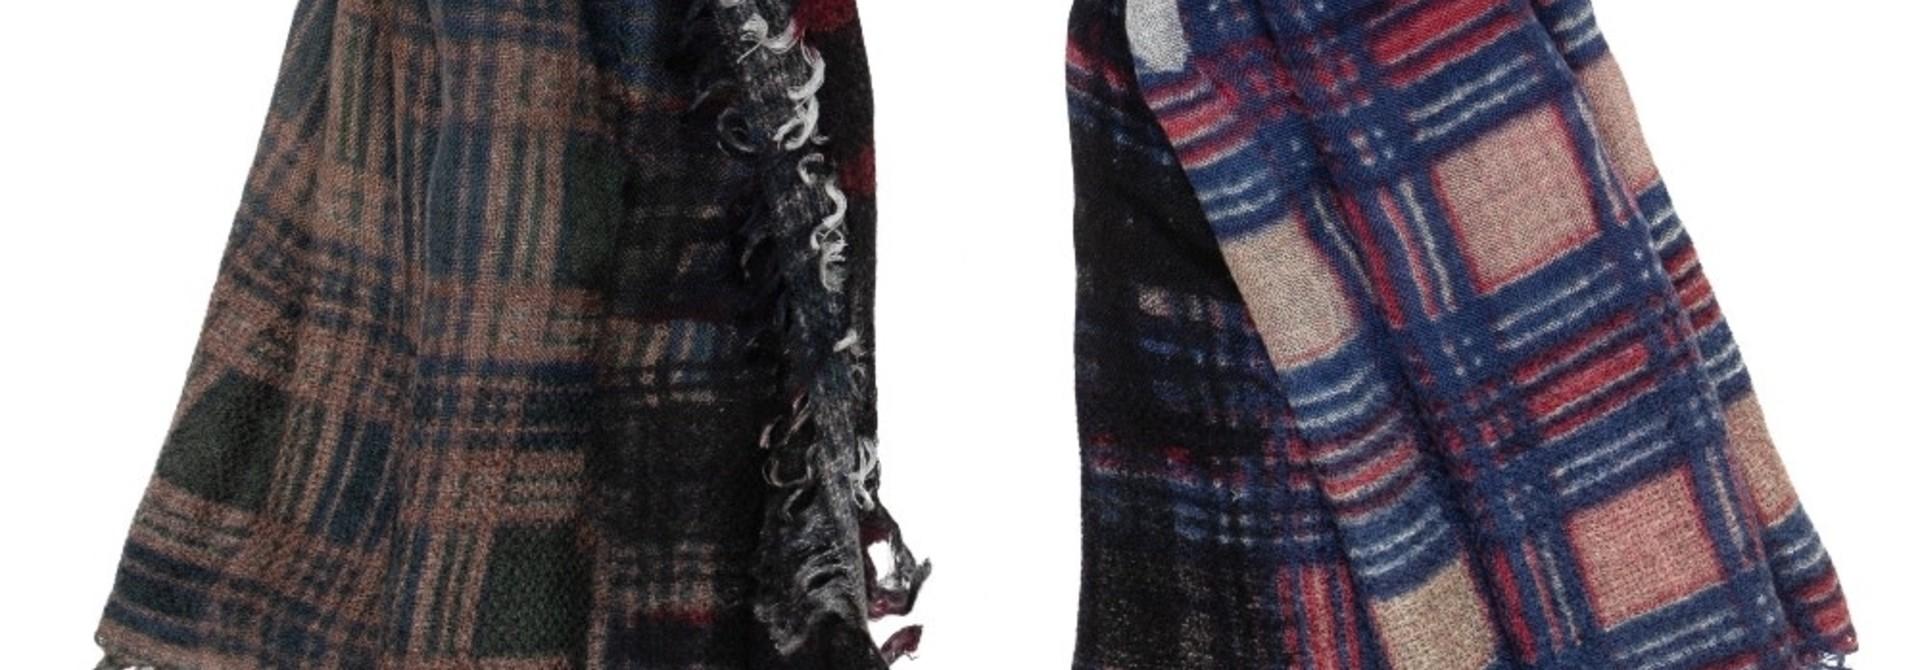 Faliero Sarti Shirt I20 2237